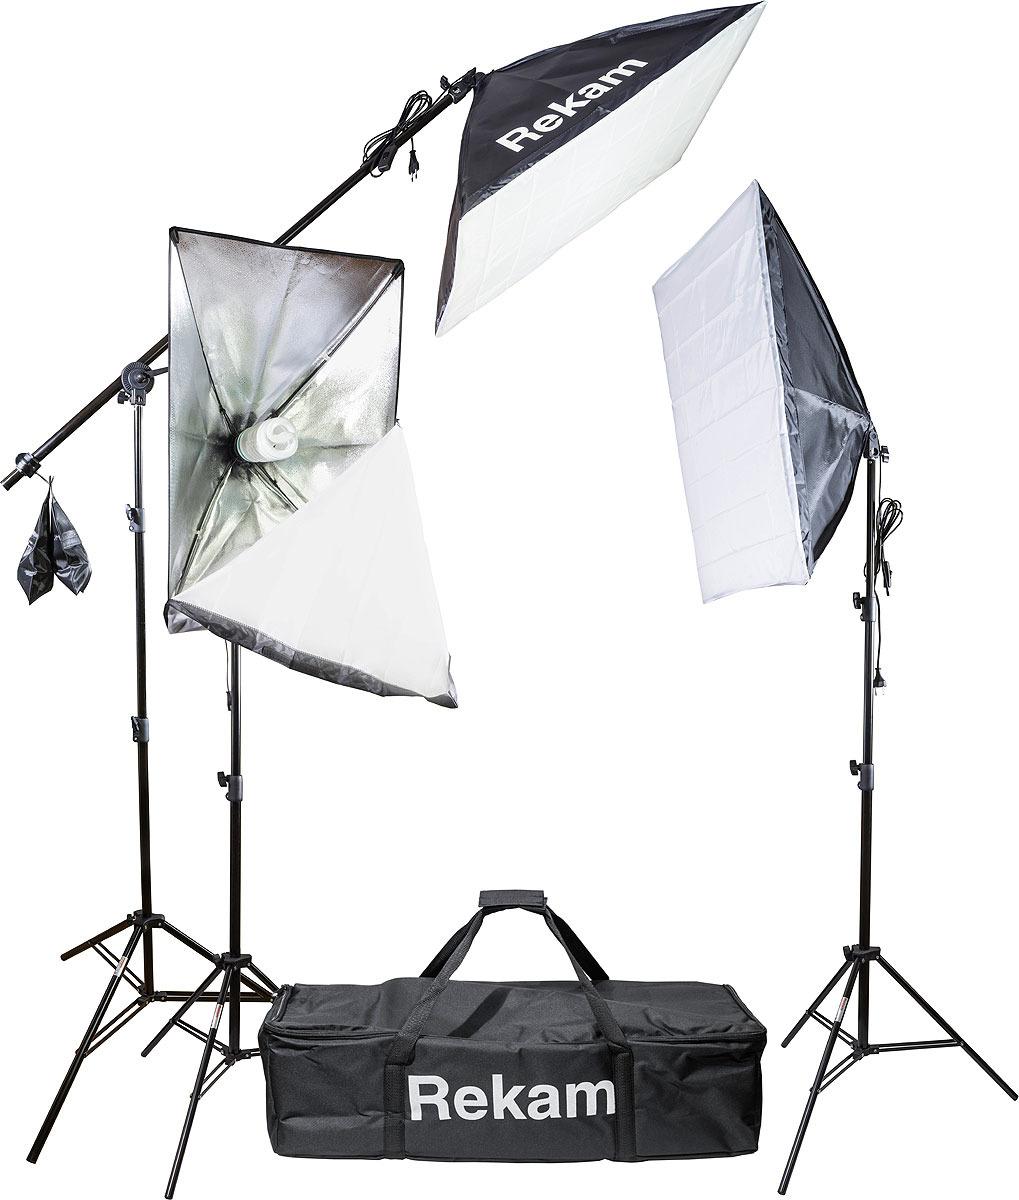 Комплект флуоресцентных осветителей Rekam CL-435-FL3-SB Boom Kit & CL-435-FL3-SB B Kit, Black